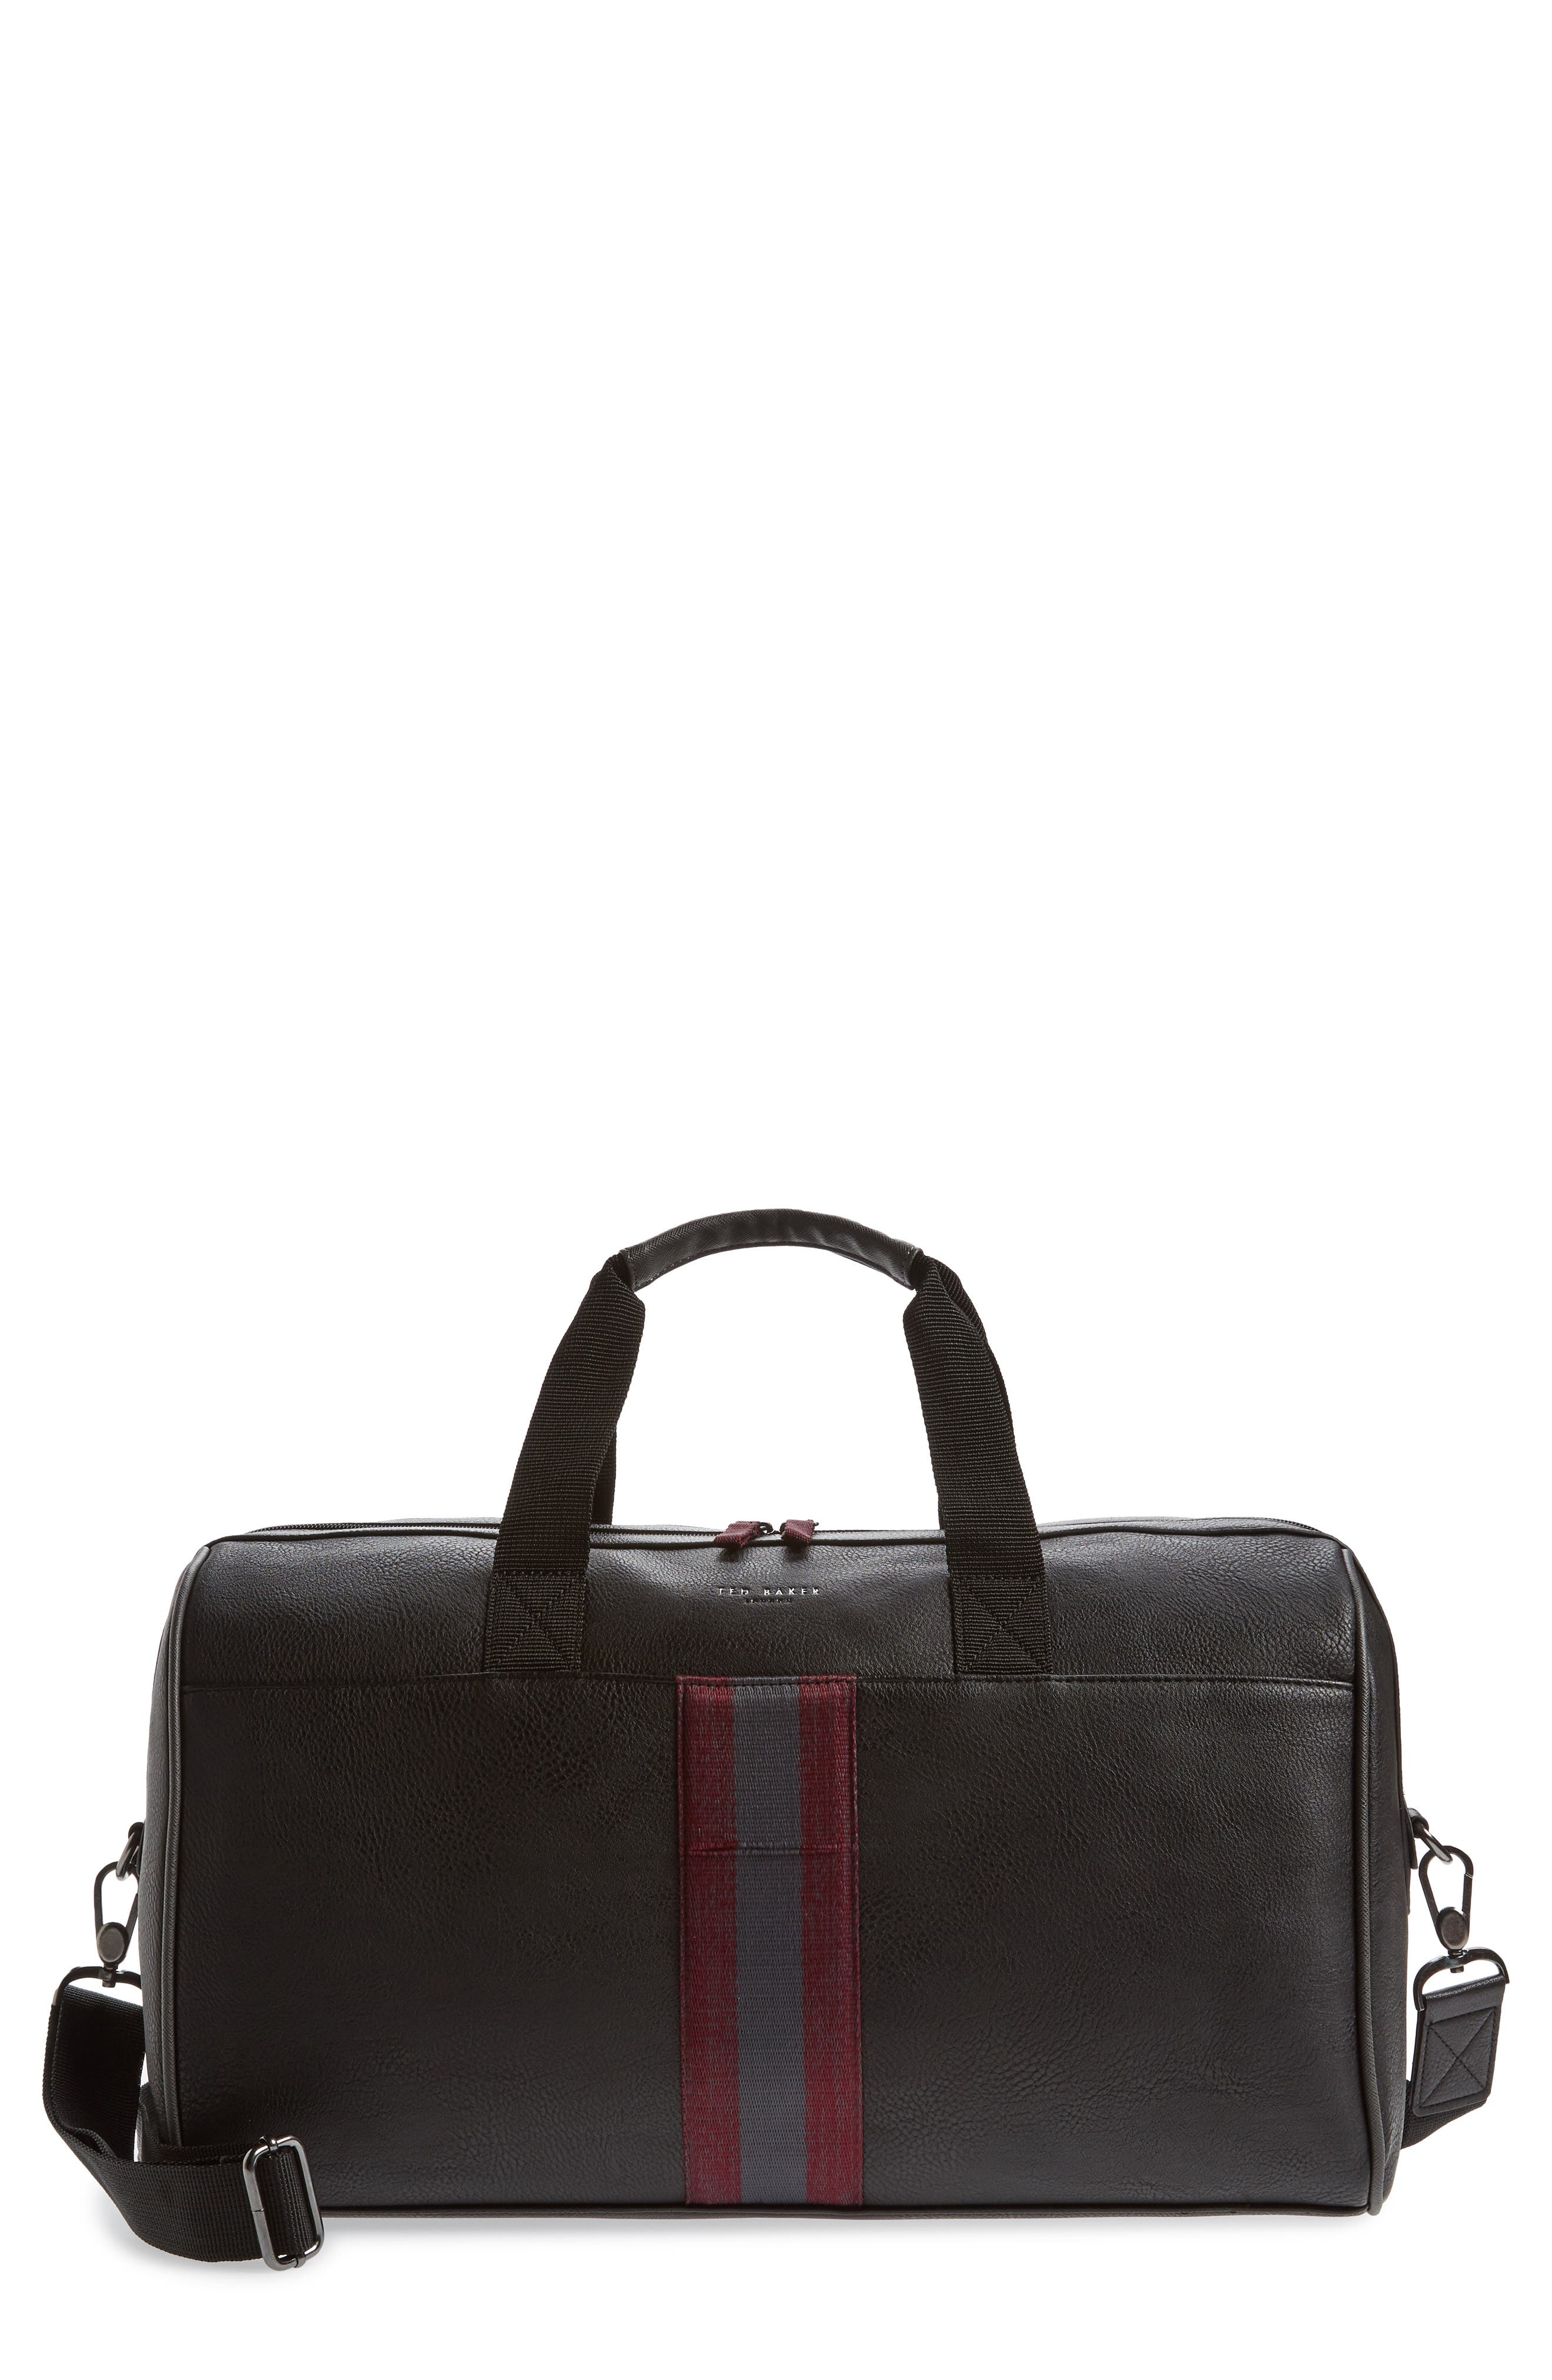 Main Image - Ted Baker London Ospray Duffel Bag